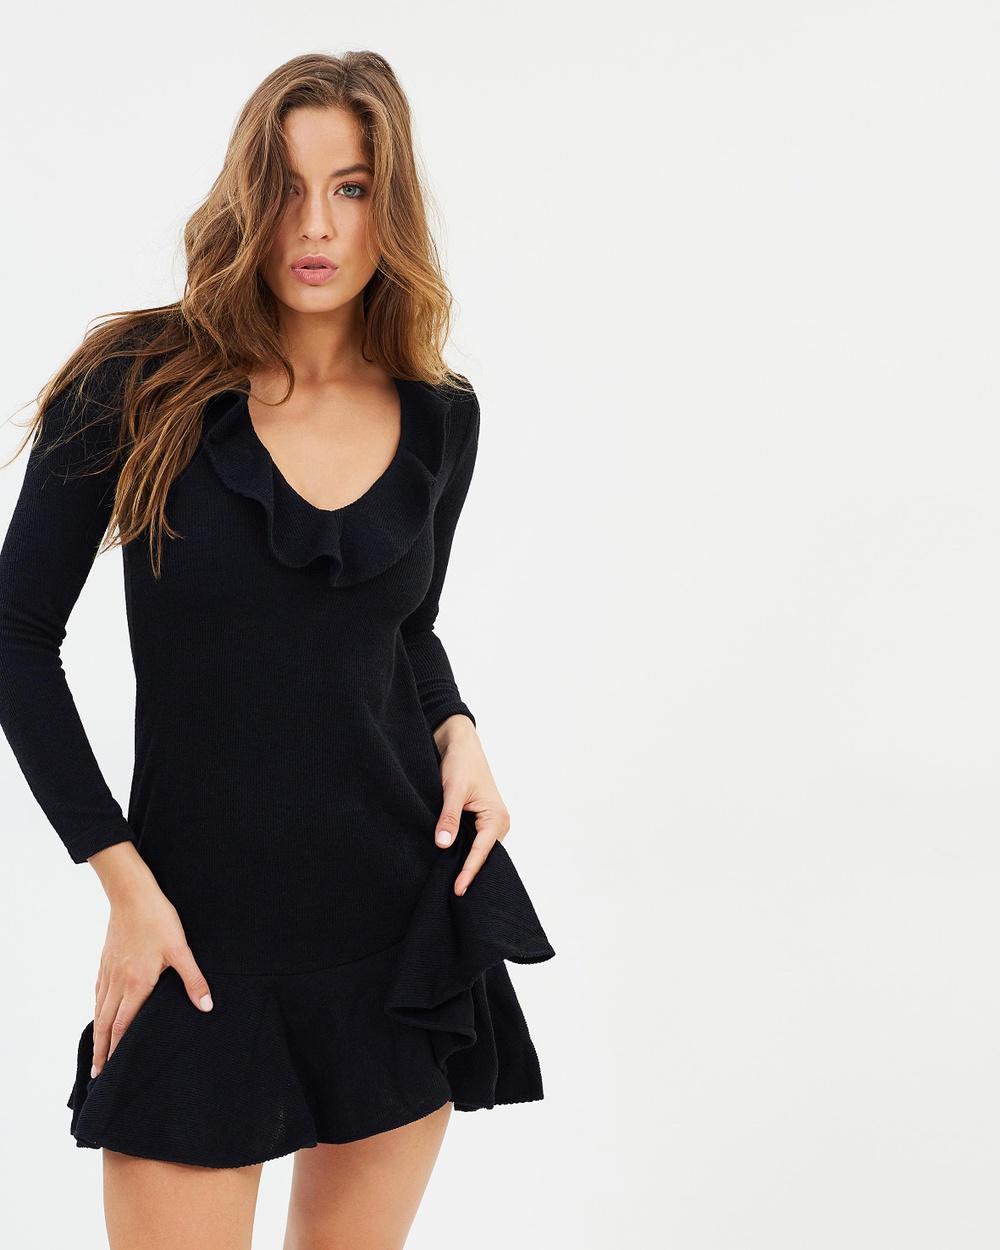 Shona Joy Demy Frill Collar Bodycon Dress Dresses Black Demy Frill Collar Bodycon Dress